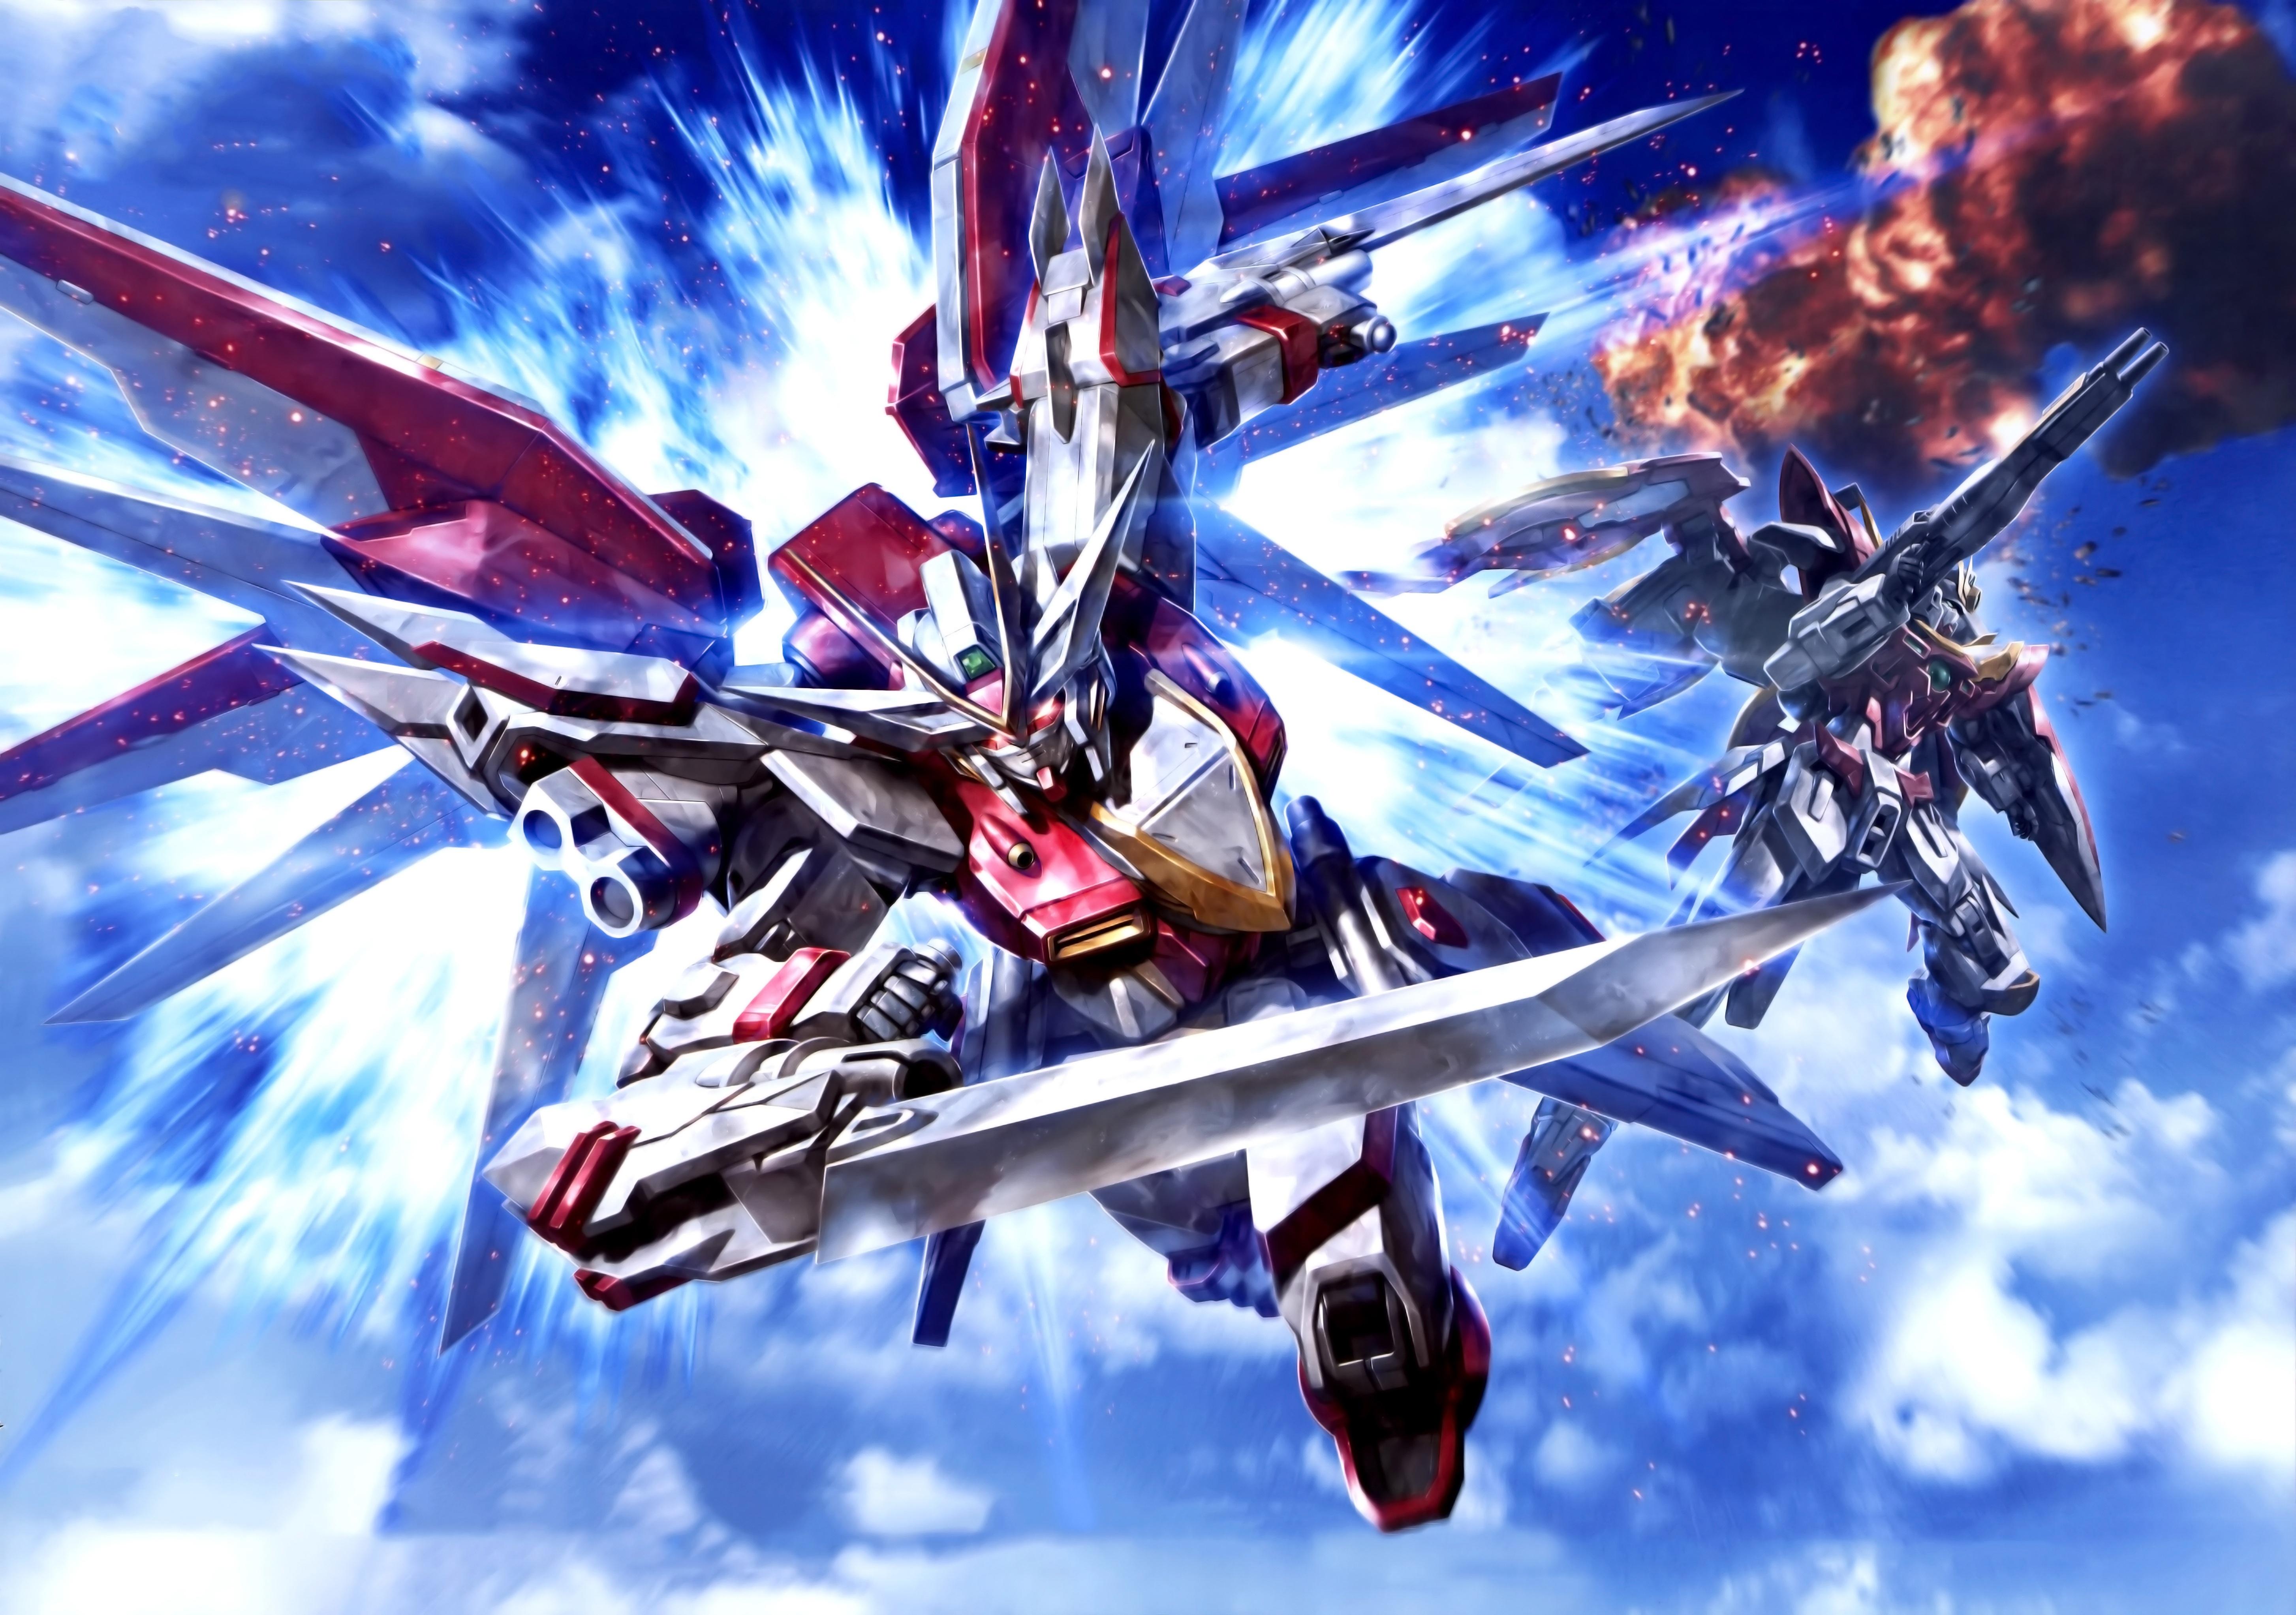 Mobile Suit Gundam 5k Retina Ultra HD Wallpaper ...